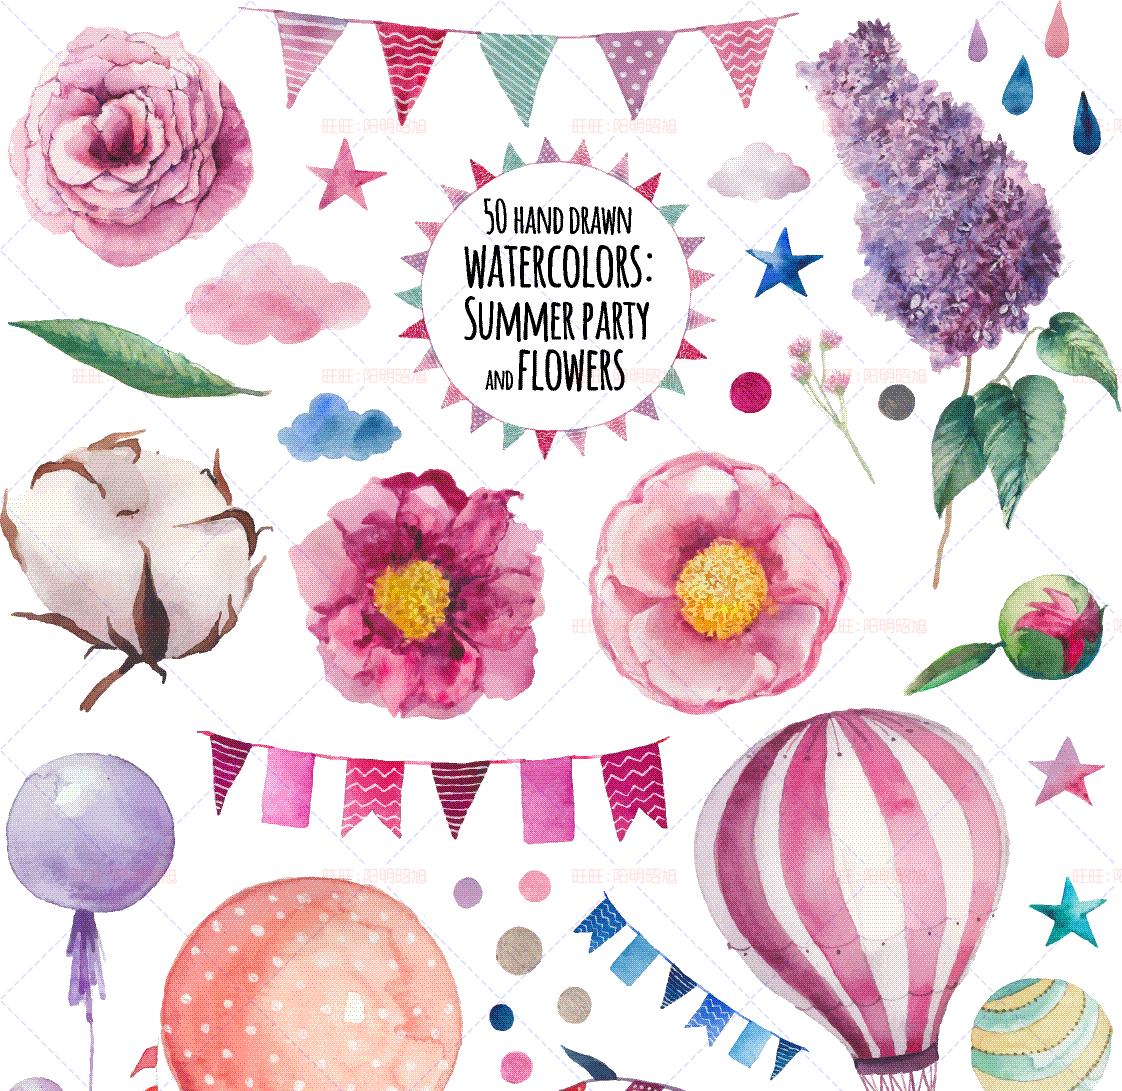 png免扣抠eps矢量图海报卡片请柬设计素材热气球花